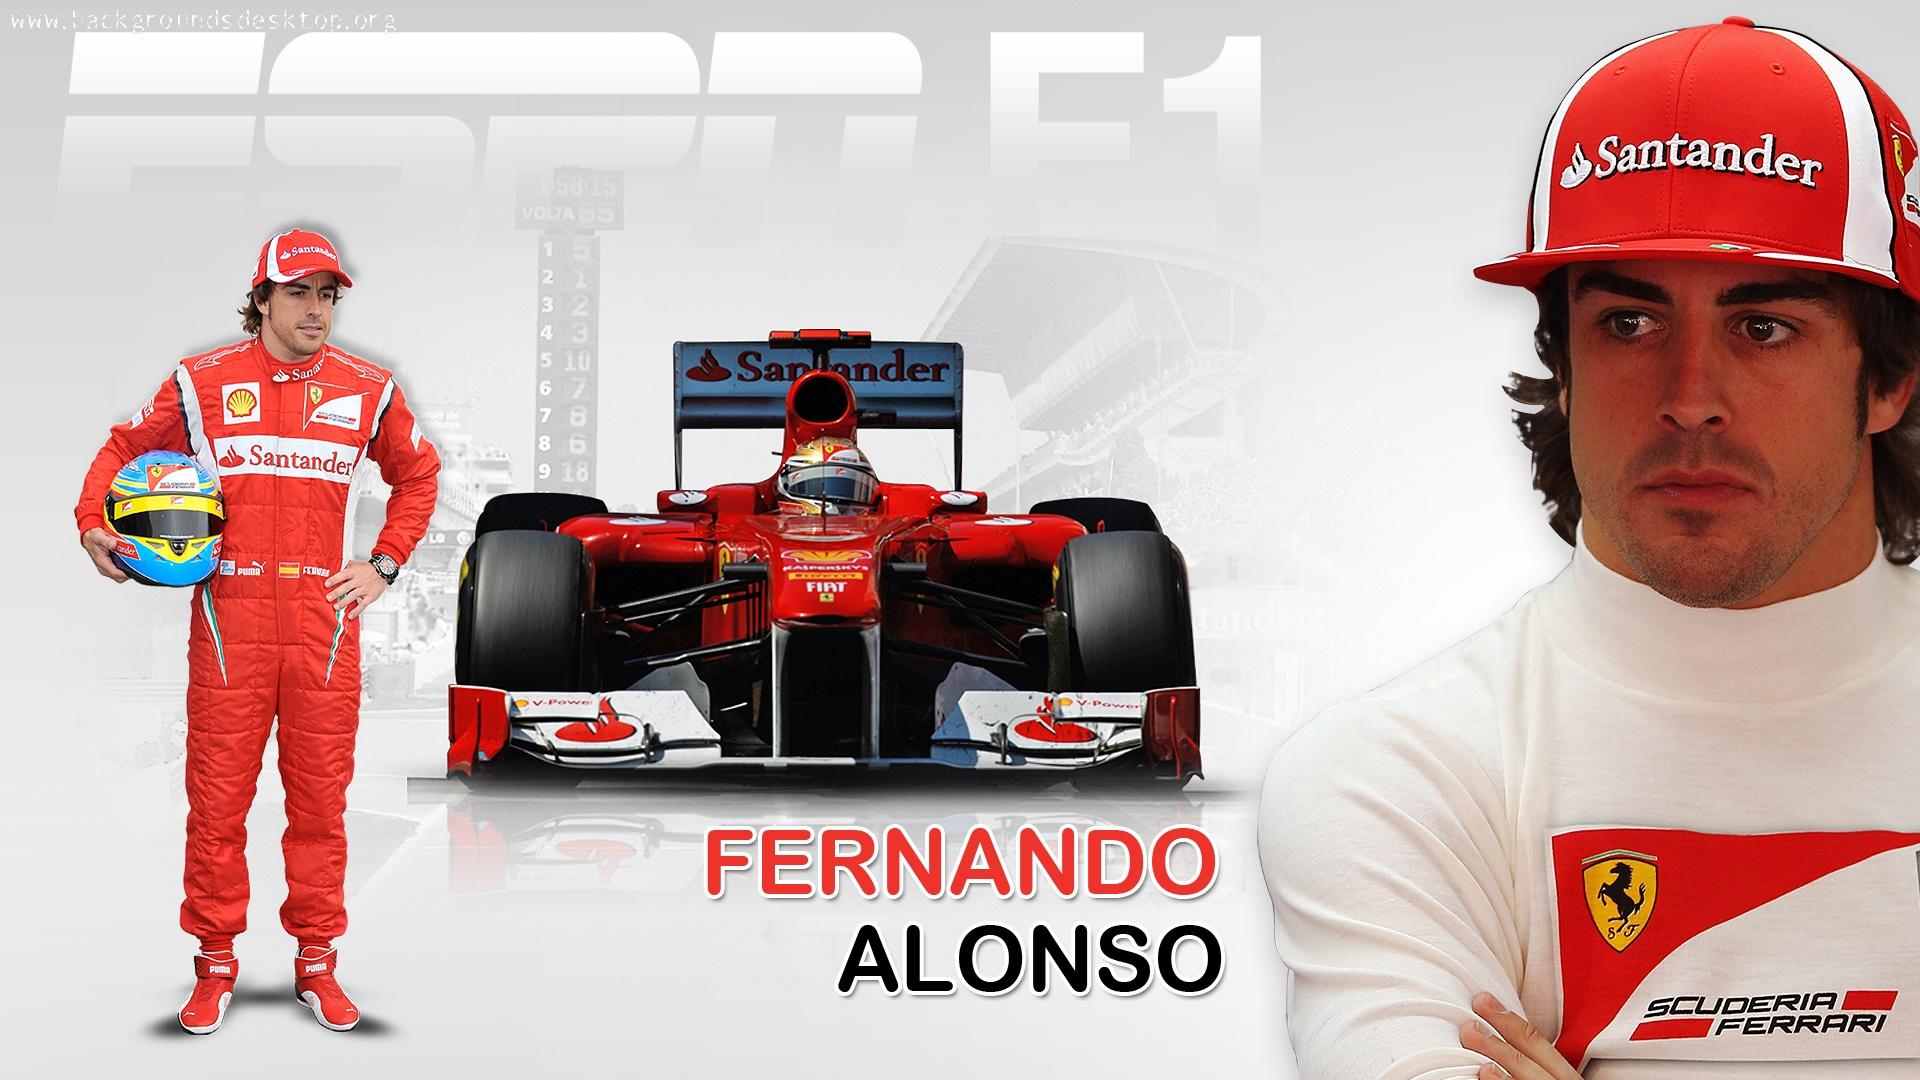 Fernando Alonso wallpaper 256943 1920x1080